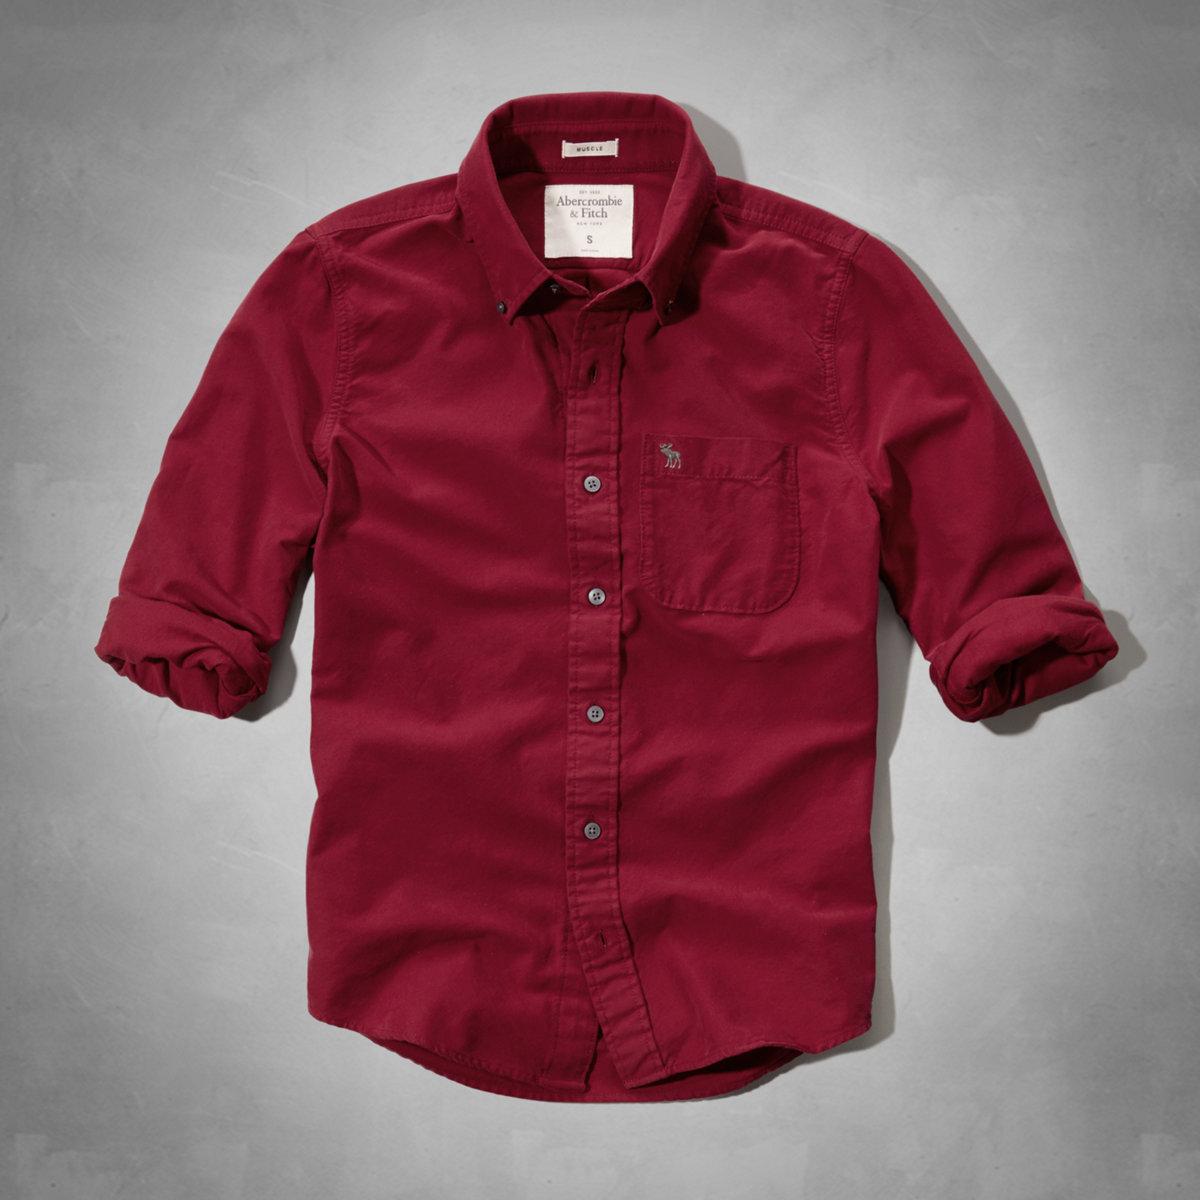 hype | Rakuten Global Market: Abercrombie casual shirt mens ...